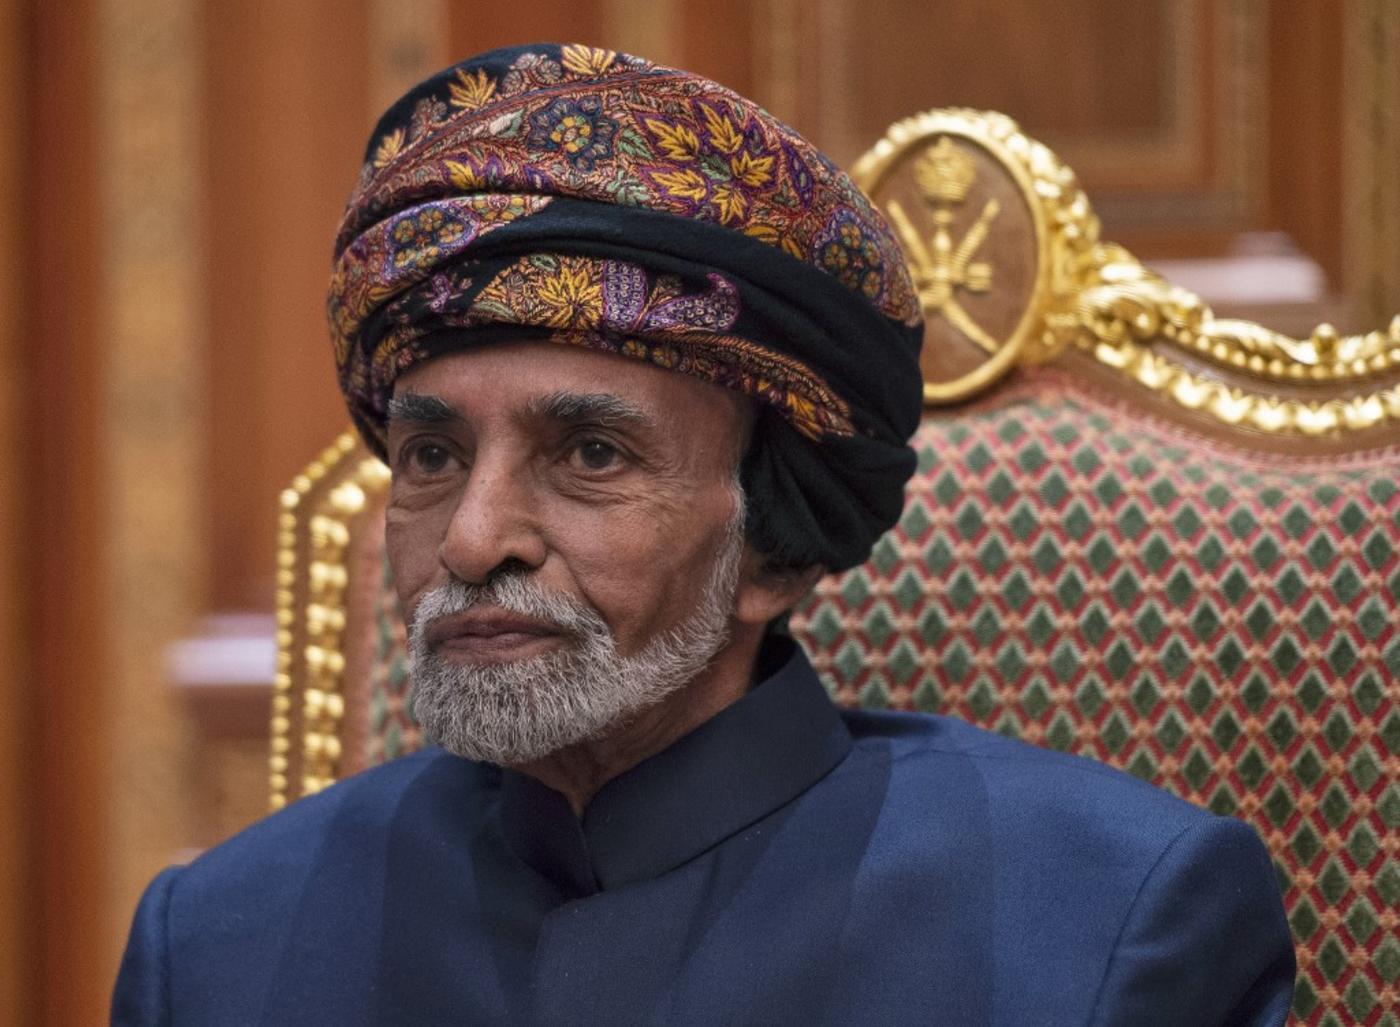 Sultan 2019